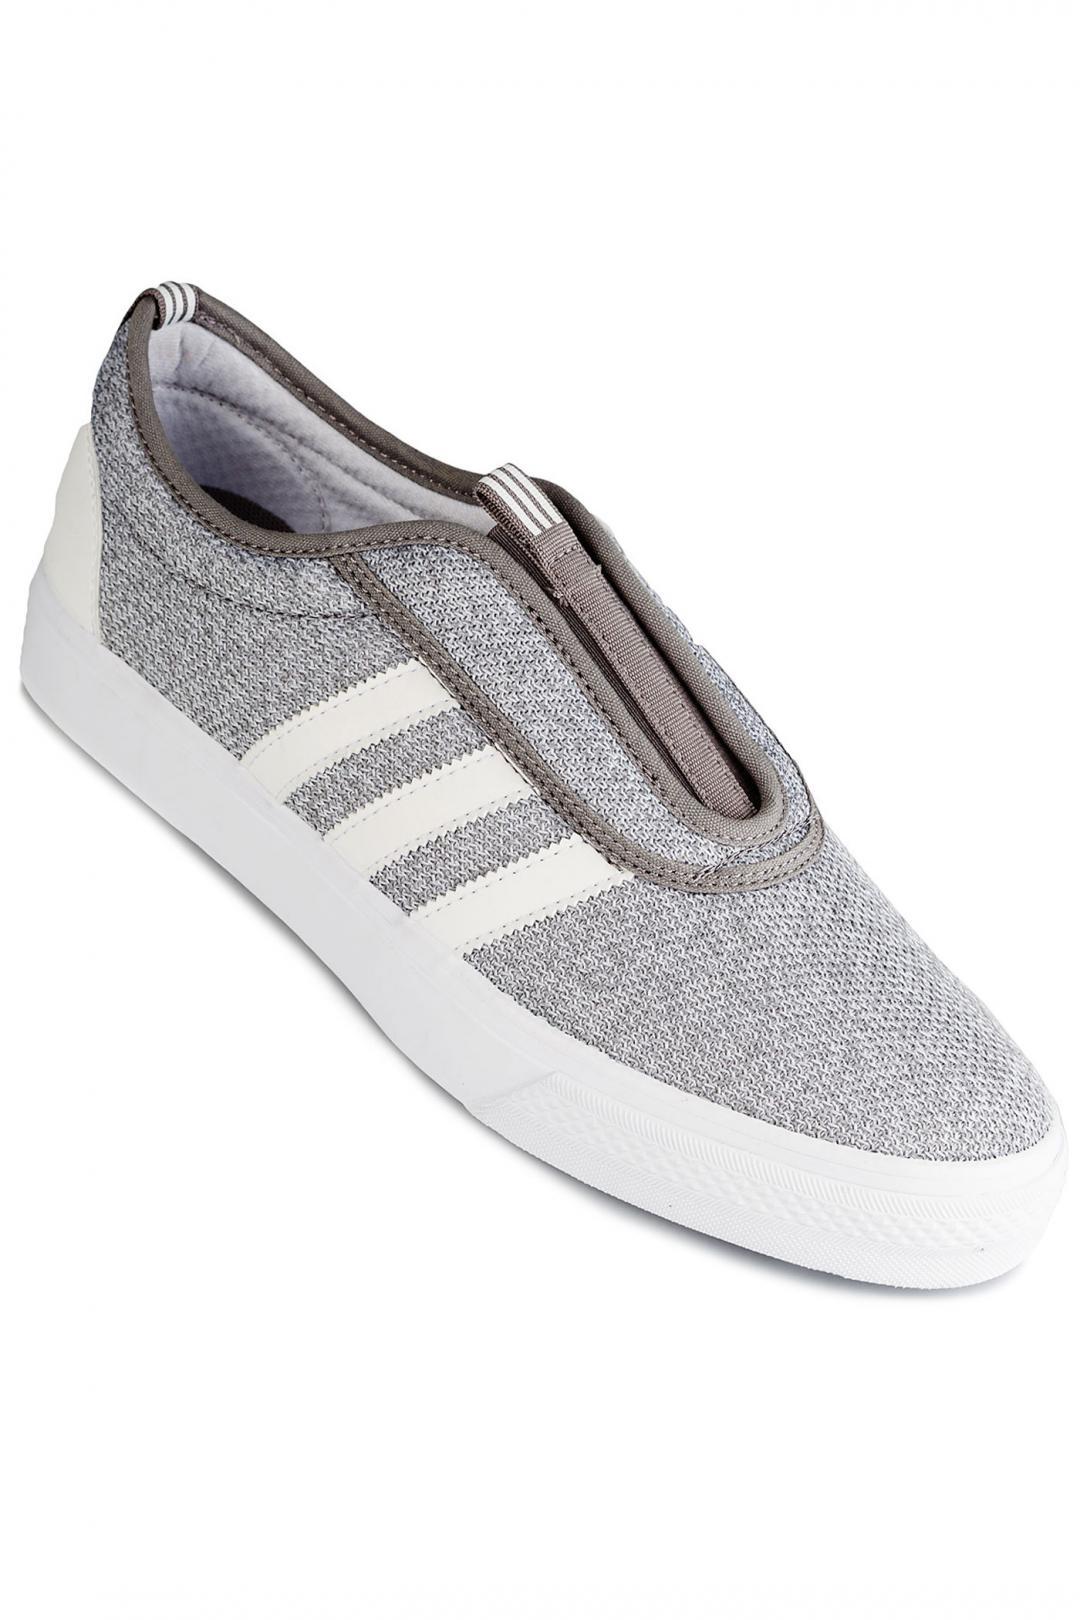 Uomo adidas Adi Ease Kung Fu charcoal white white | Scarpe da skate